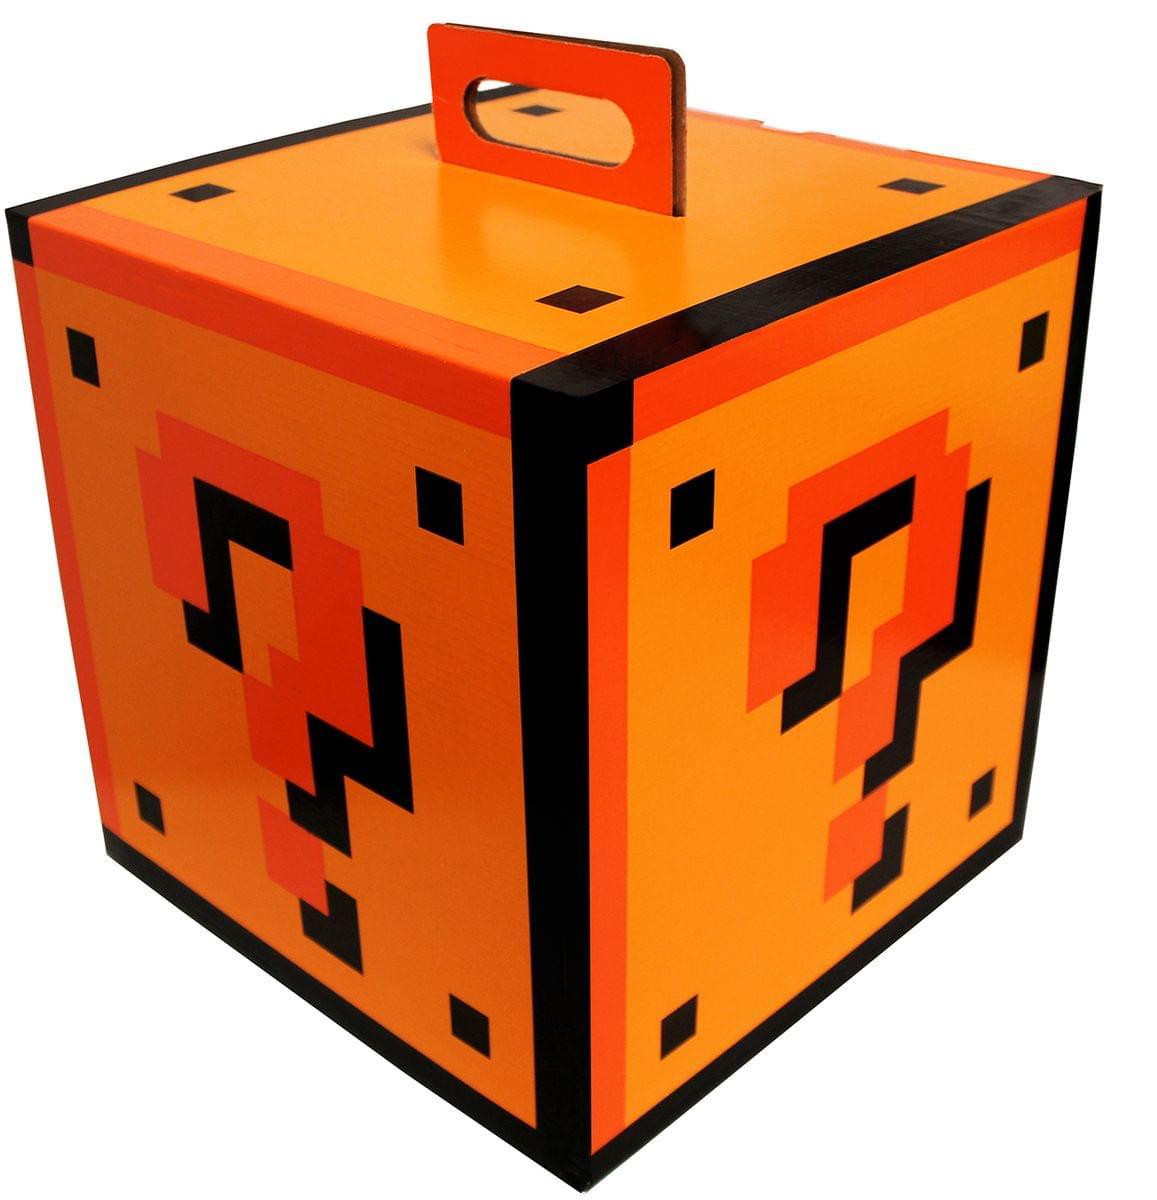 5x5x5 Question Mark Empty Flat Gift Box